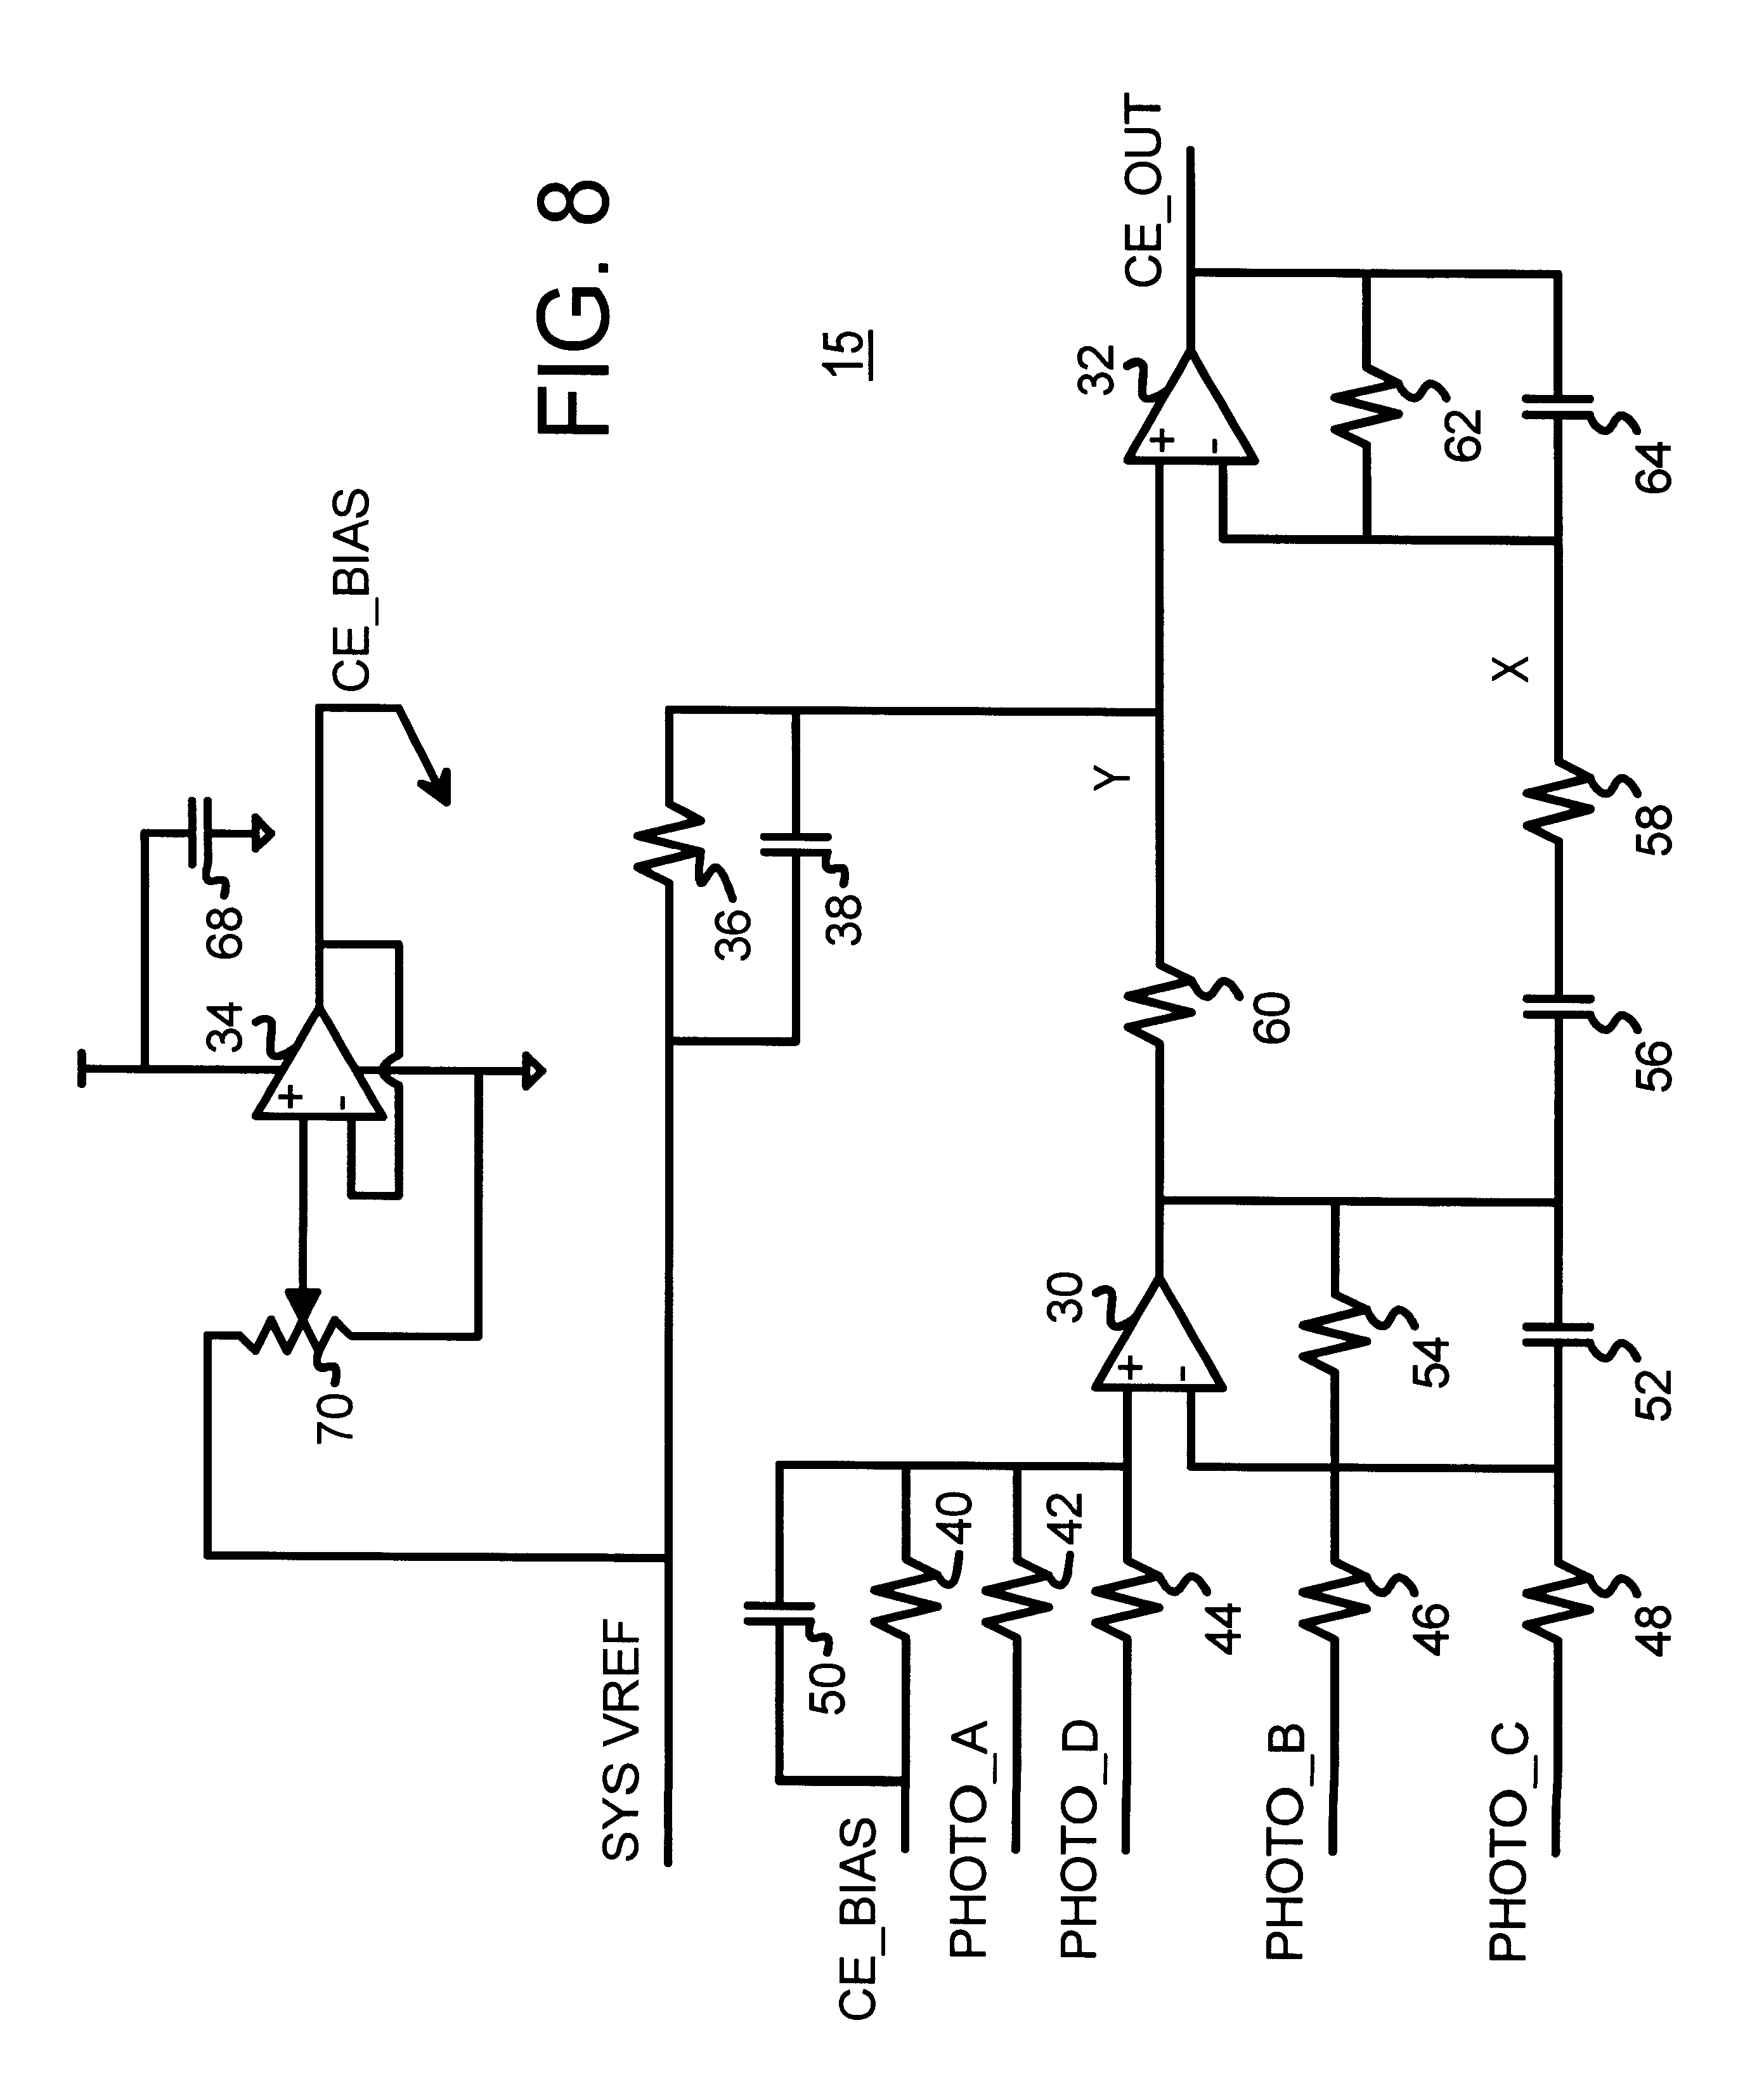 Patent Us6339565 Non Linear Center Error Generator For Dvd Servo Circuit Diagram Control Drawing